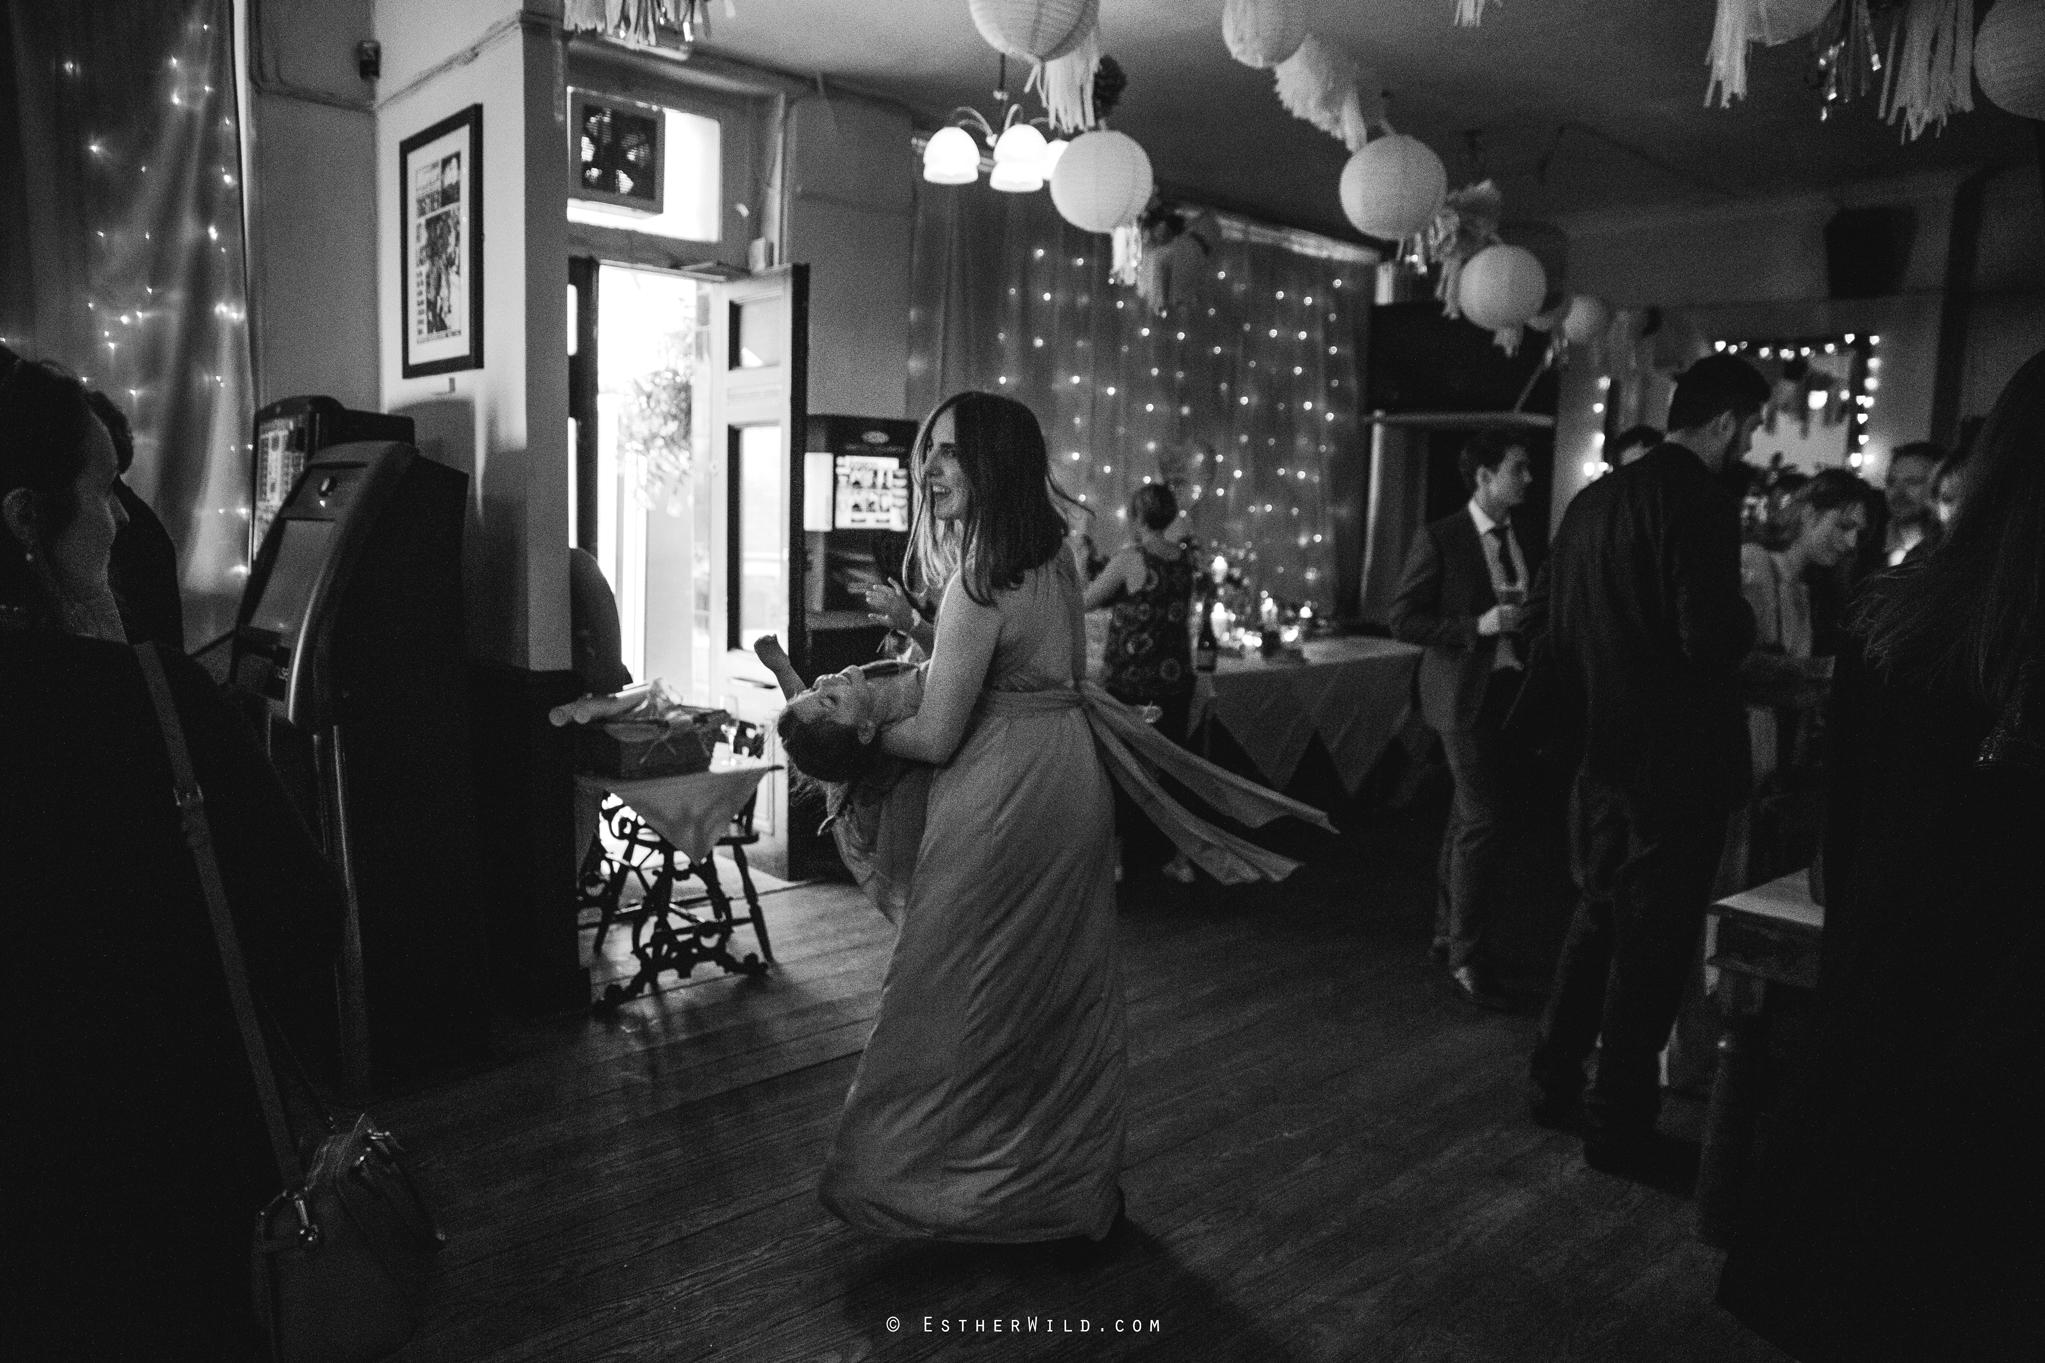 Islington_Town_Hall_Wedding_London_Photographer_Esther_Wild_IMG_7300-1.jpg